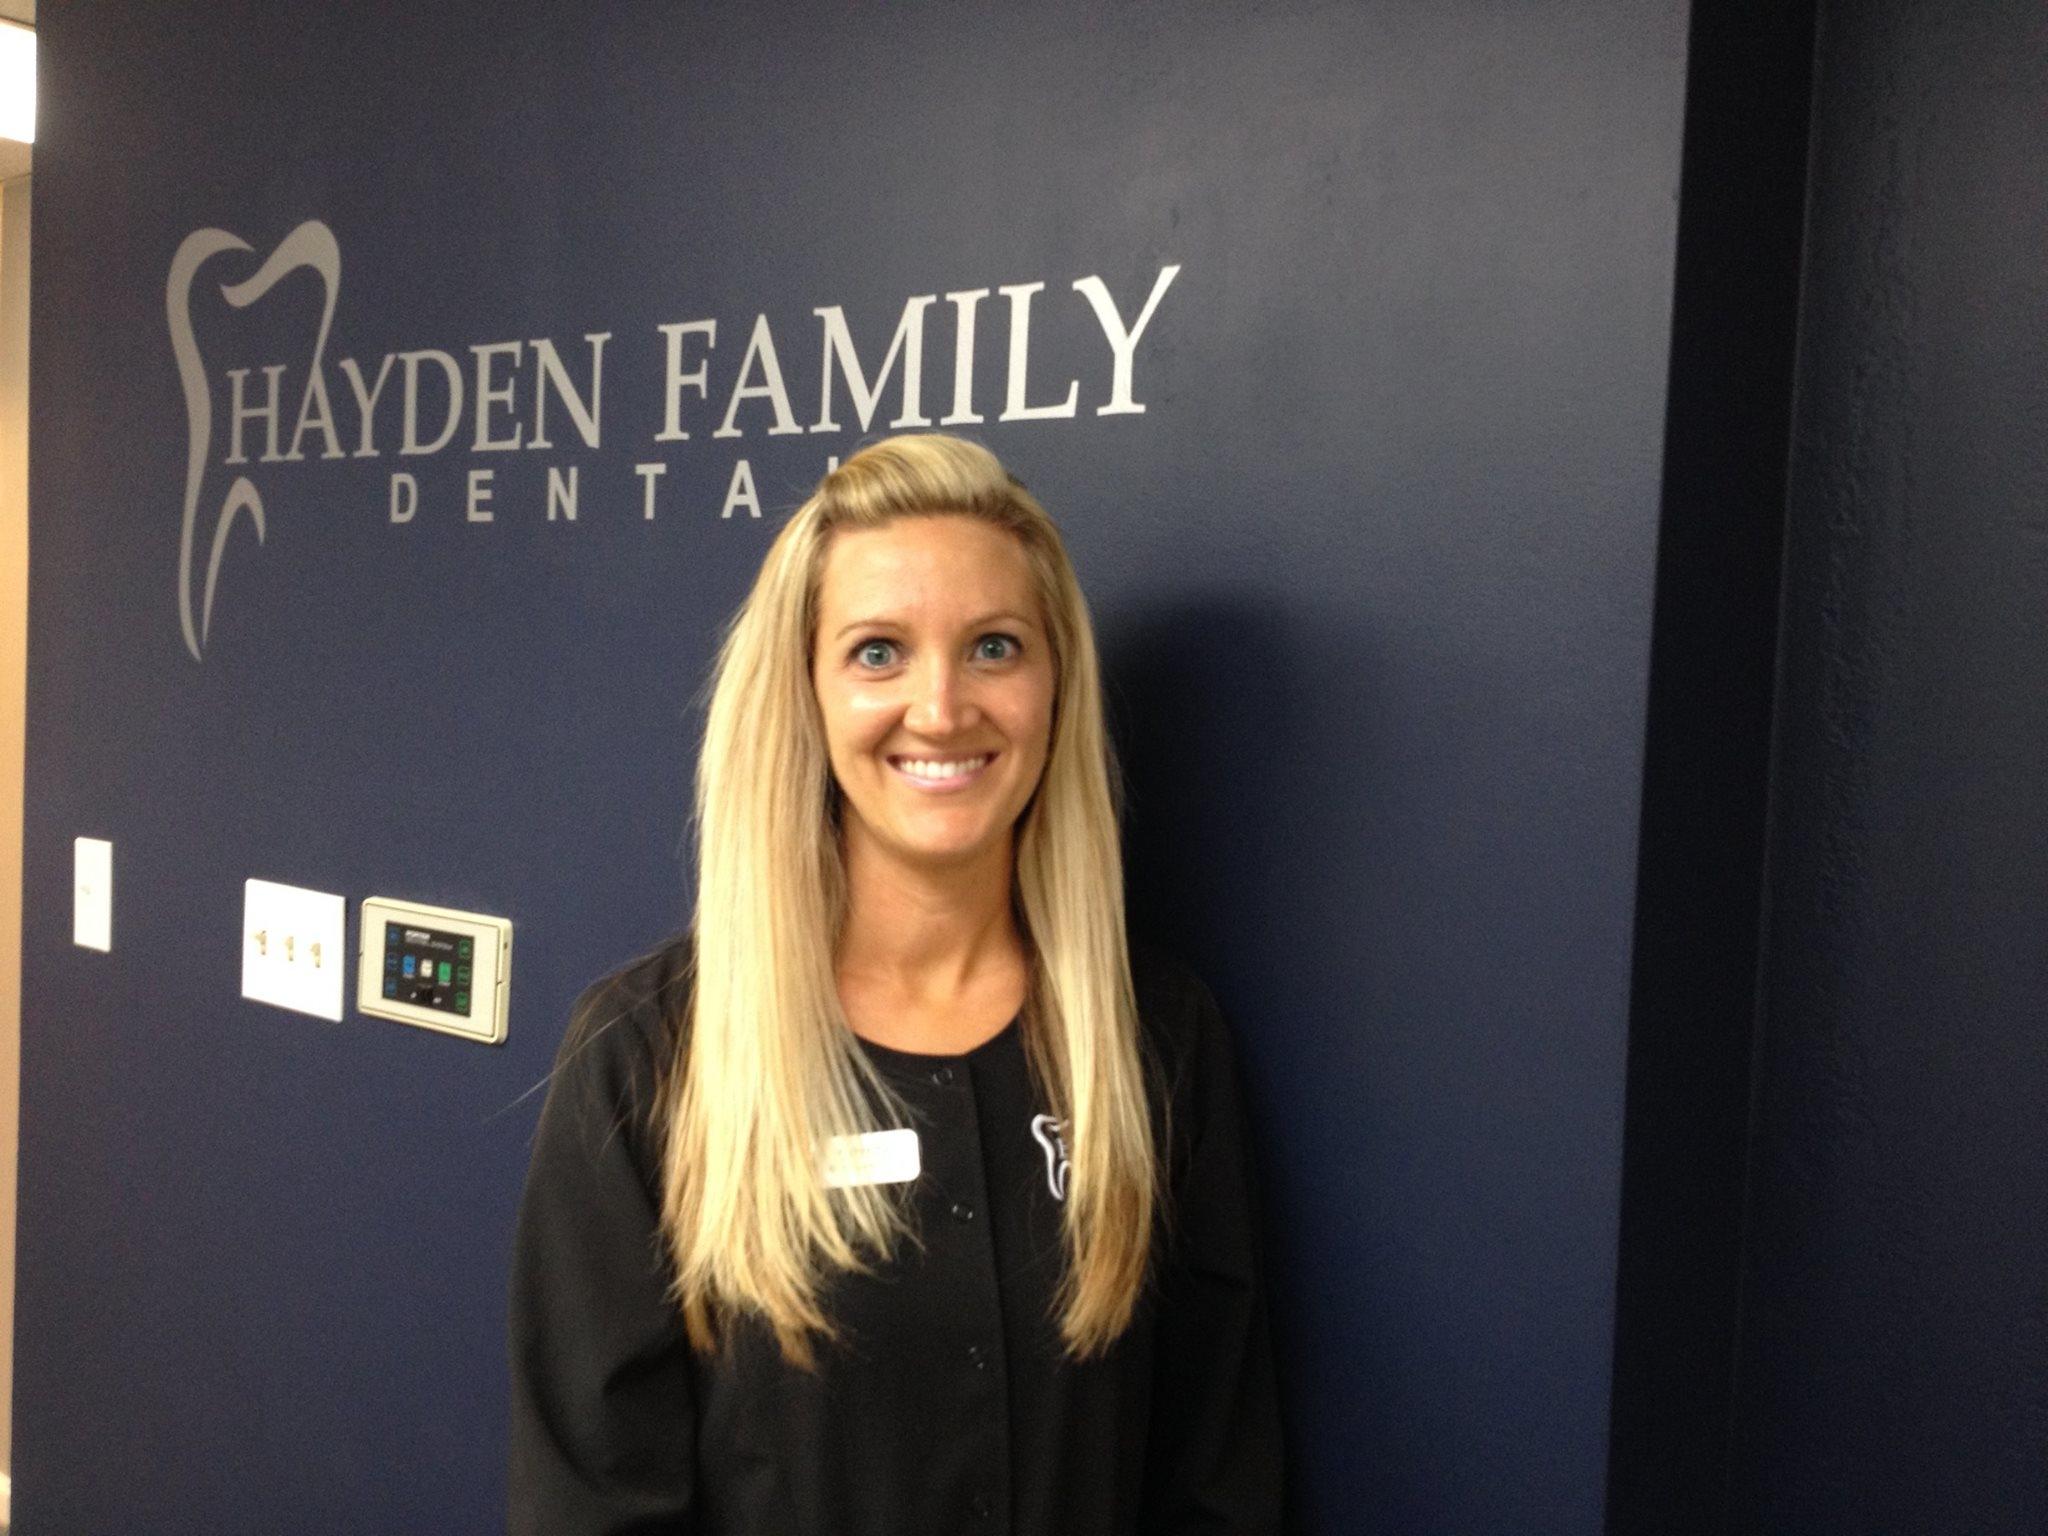 Hayden Family Dental Rebecca Hayden Dmd Coupons Near Me